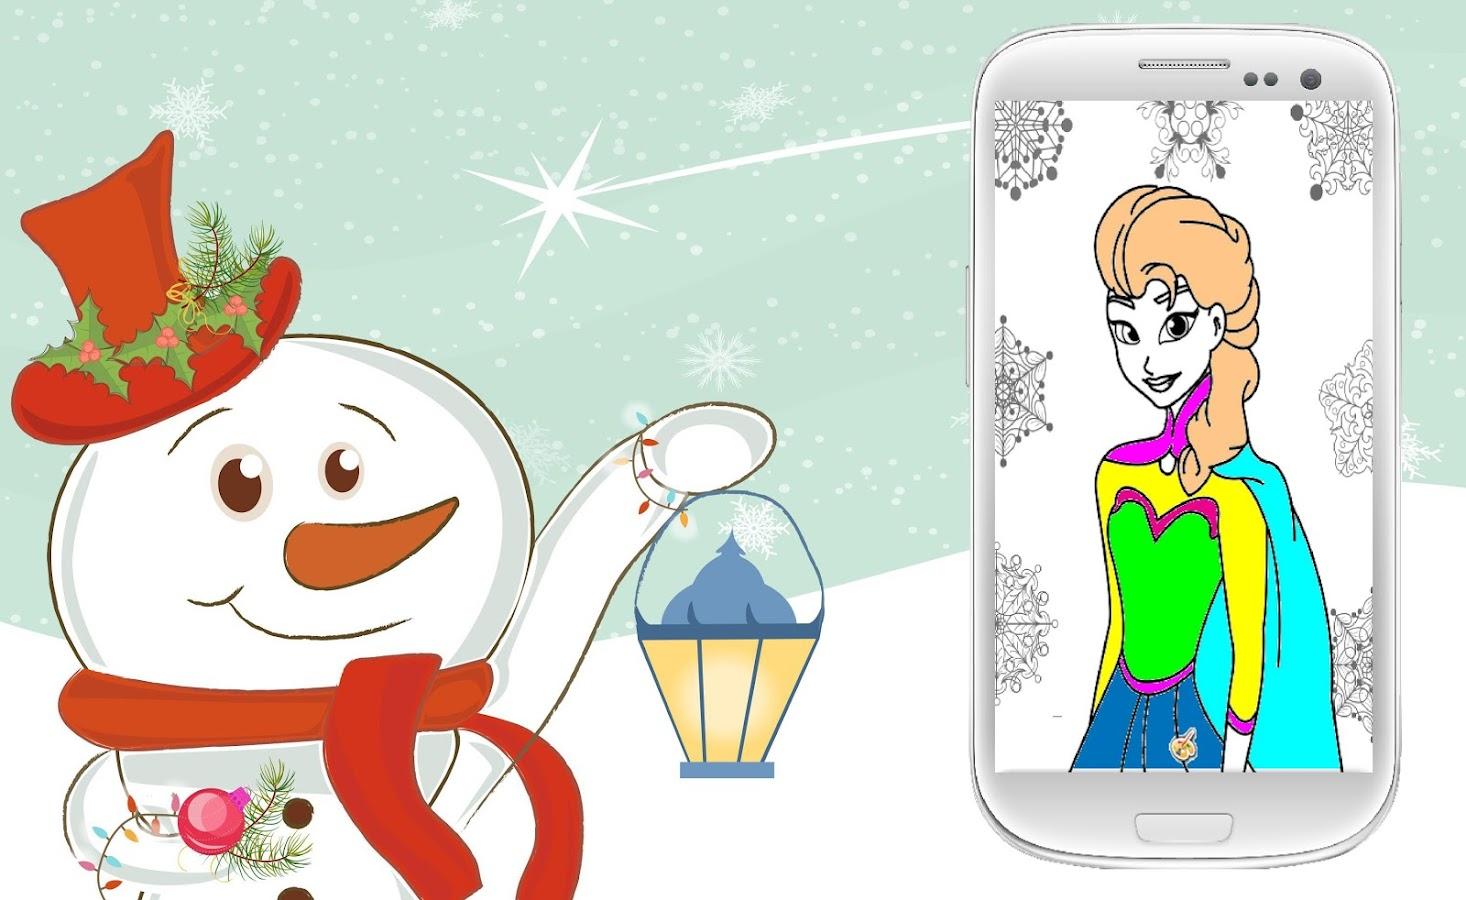 frozen coloring book screenshot - Frozen Coloring Book